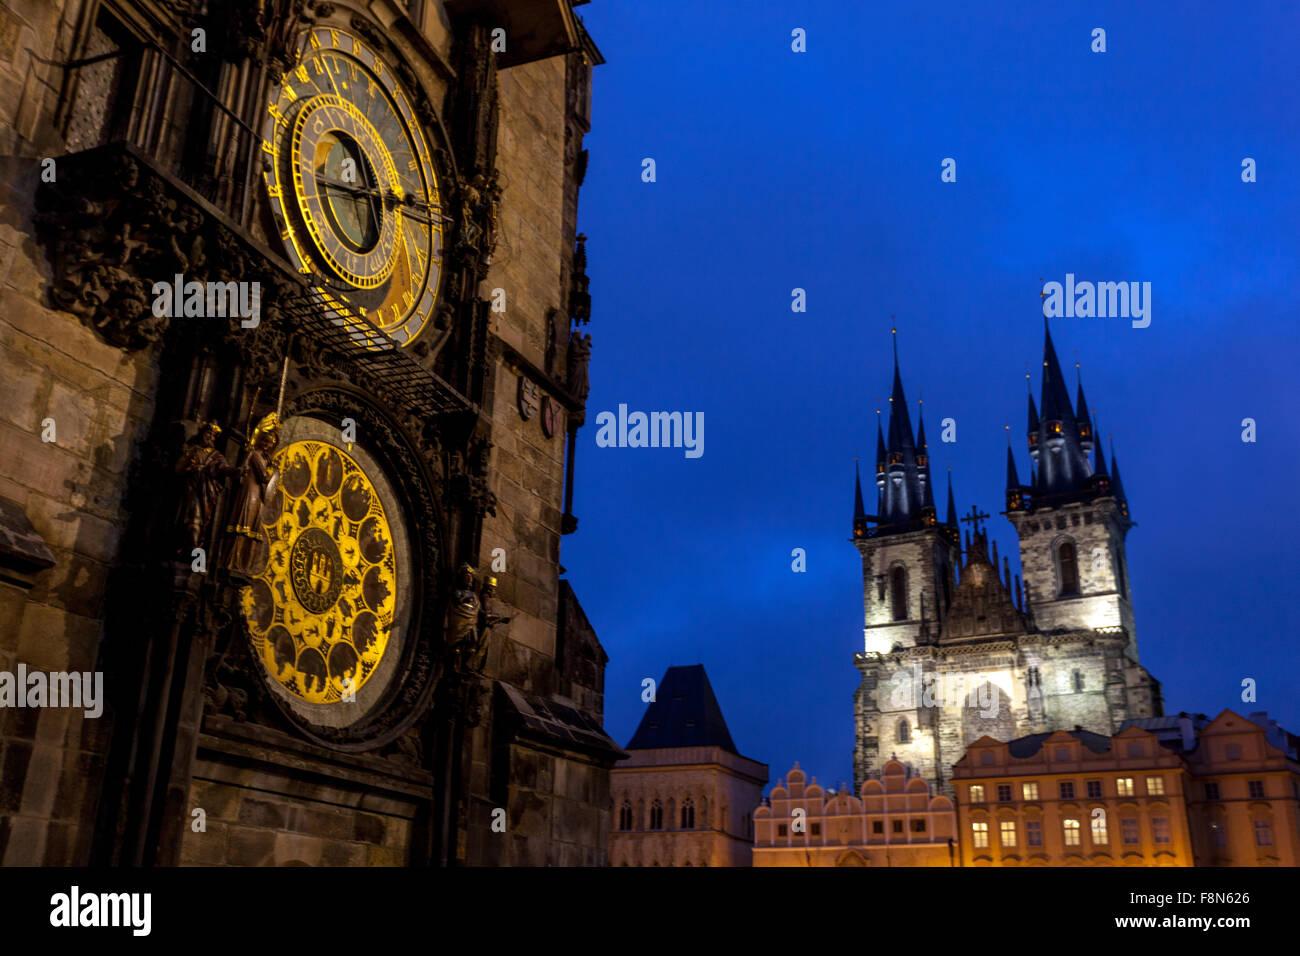 Astronomical Clock, Old Town Square, Tyn Church, Christmas time, Prague, Czech Republic - Stock Image